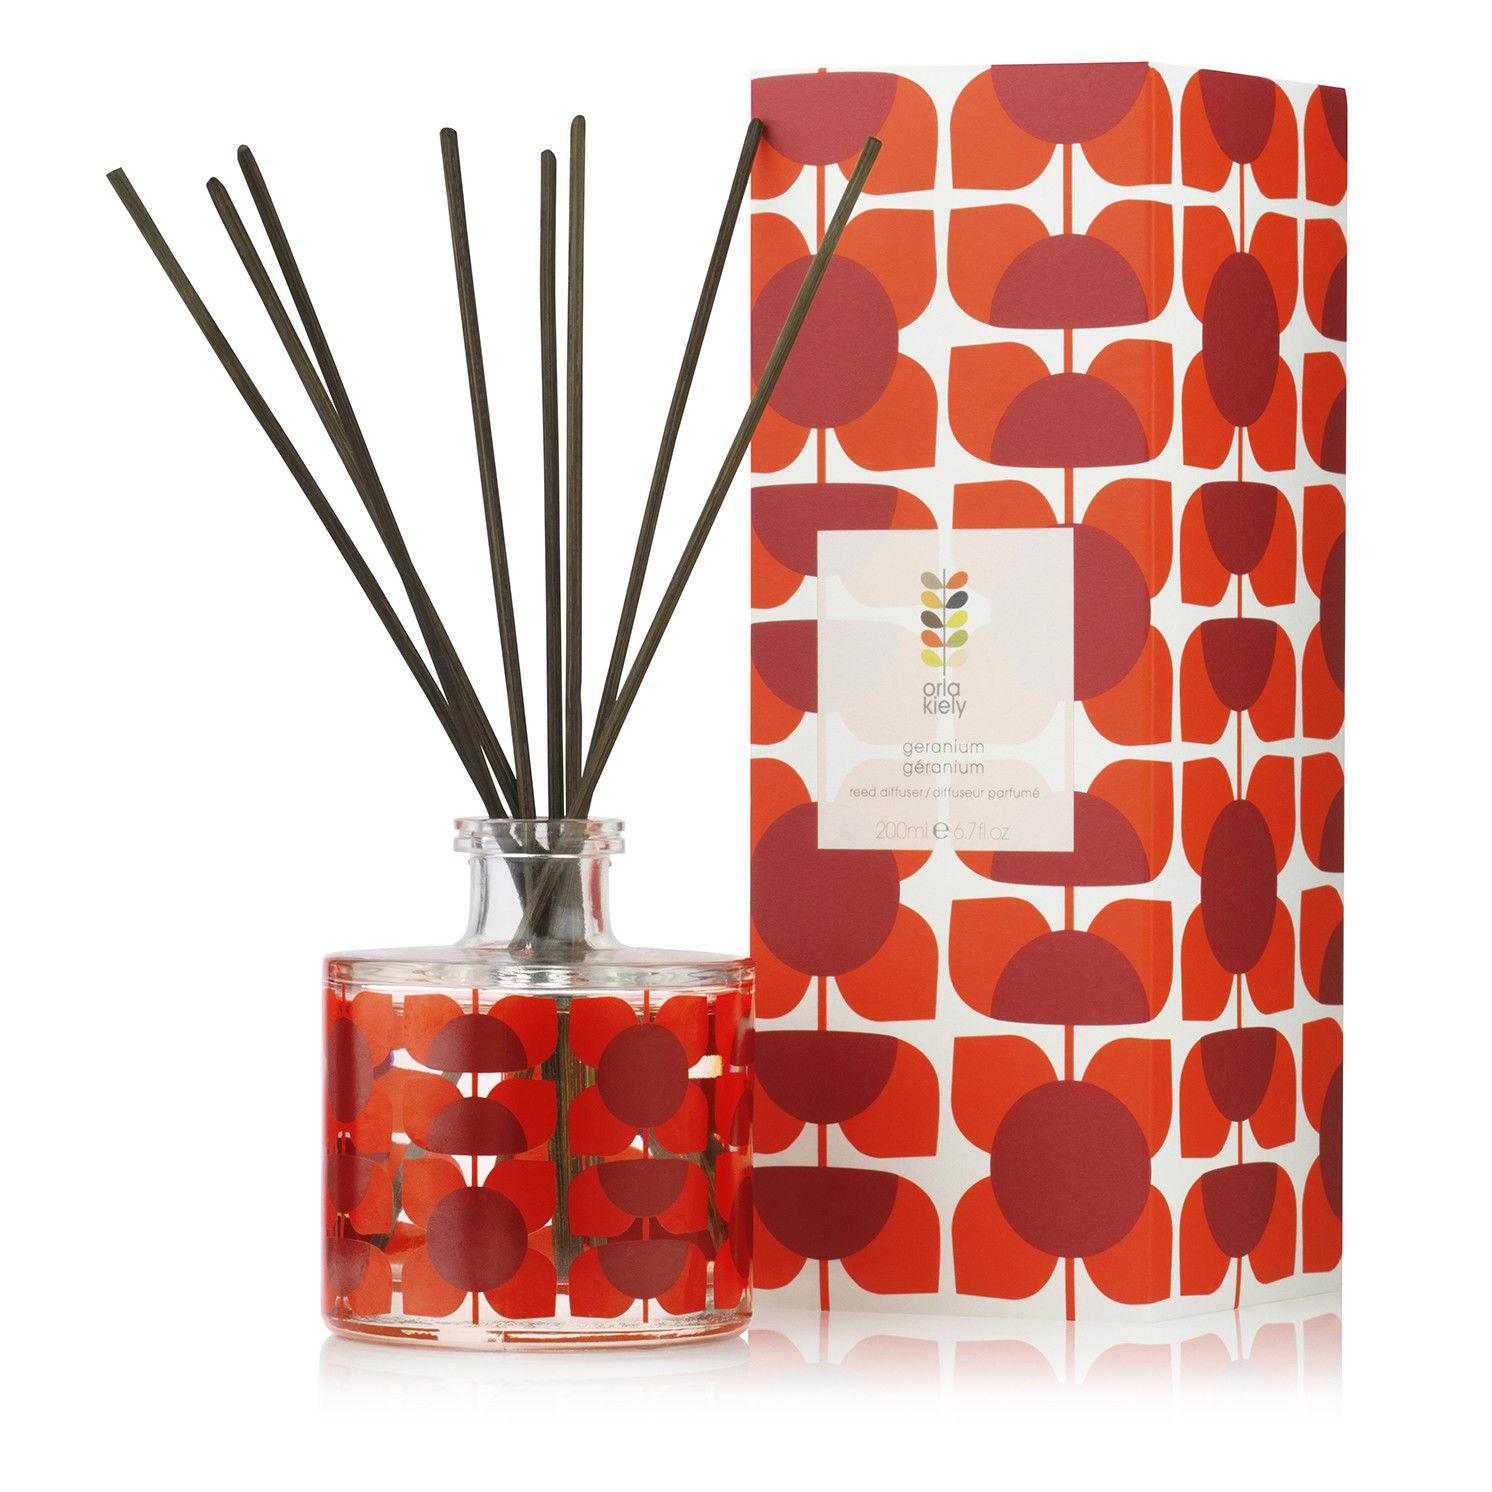 Orla Kiely – Geranium Scented Reed Diffuser in Presentation Gift Box